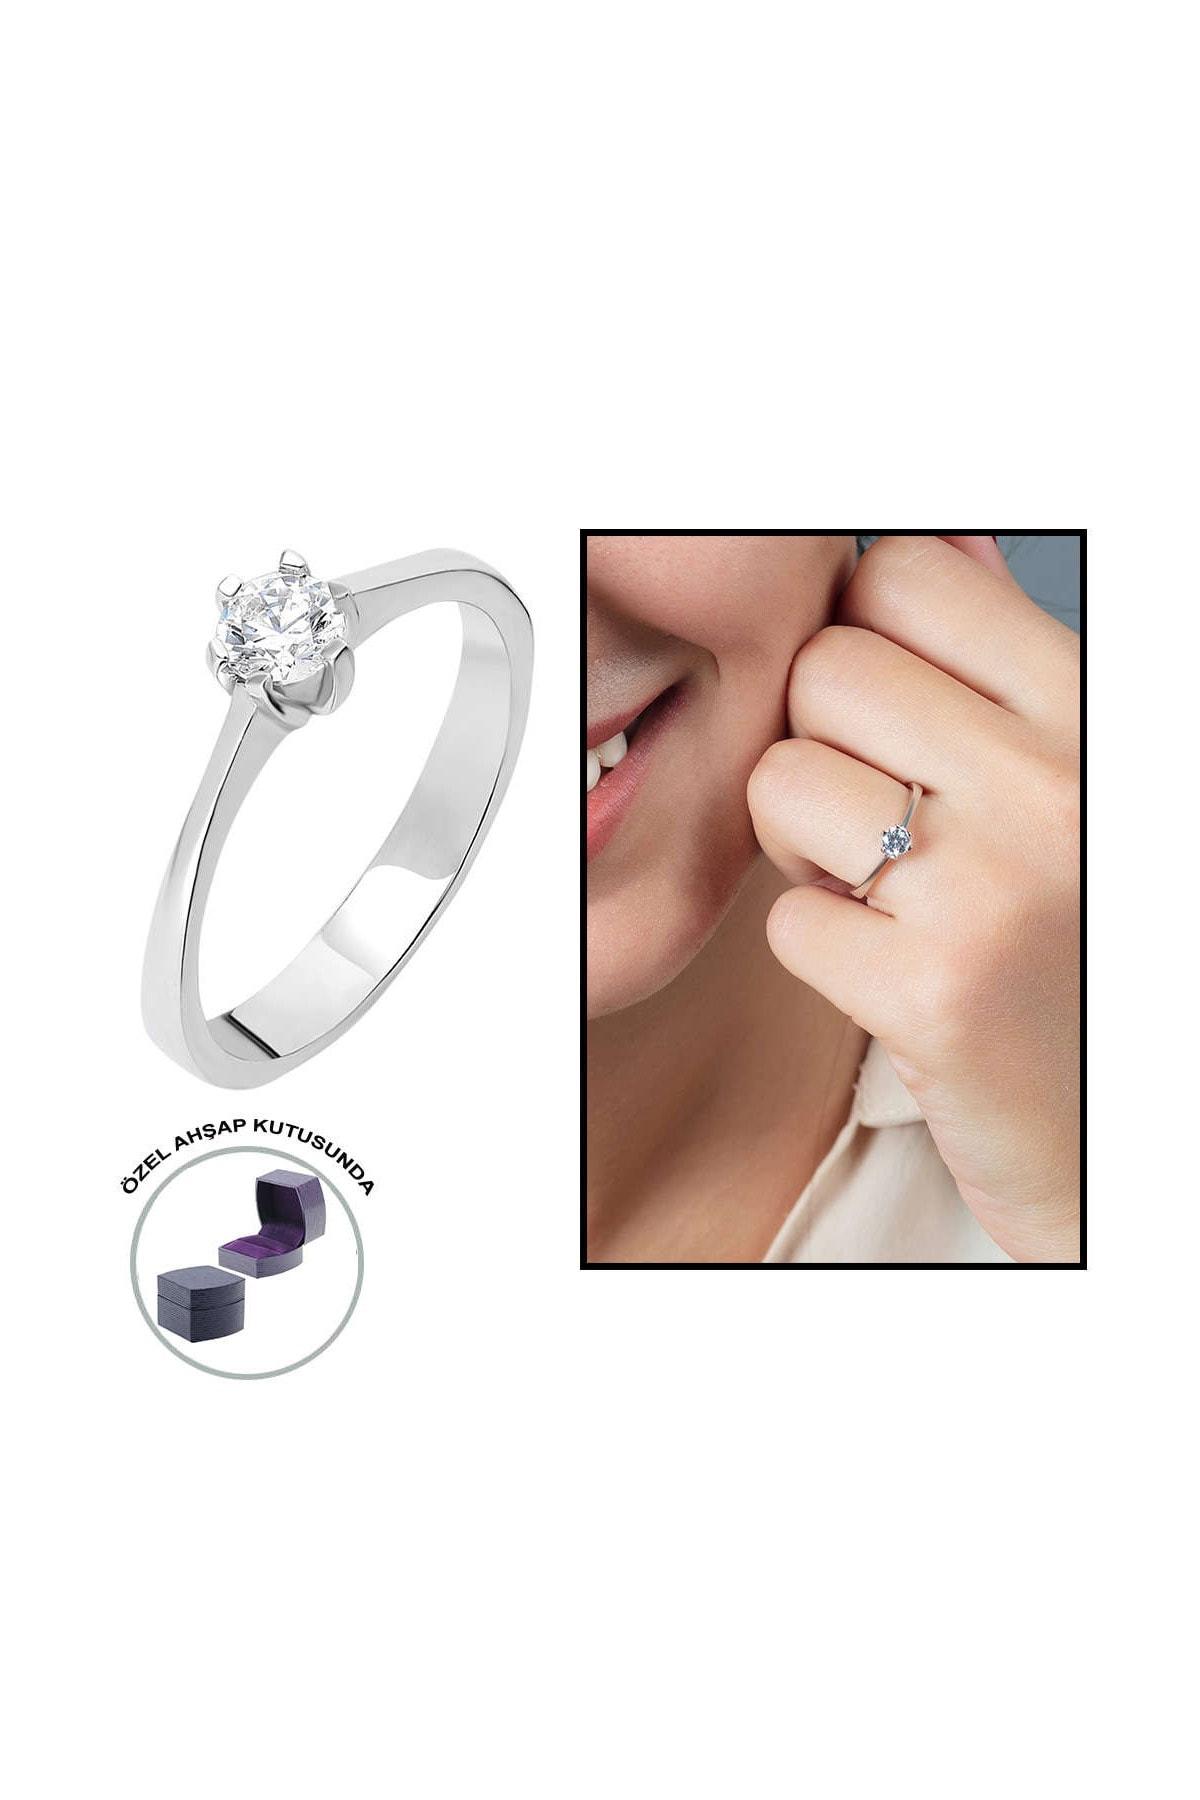 Tesbihane Starlight Diamond Pırlanta Montür Oval Tasarım 925 Ayar Gümüş Bayan Tektaş Yüzük 102001791